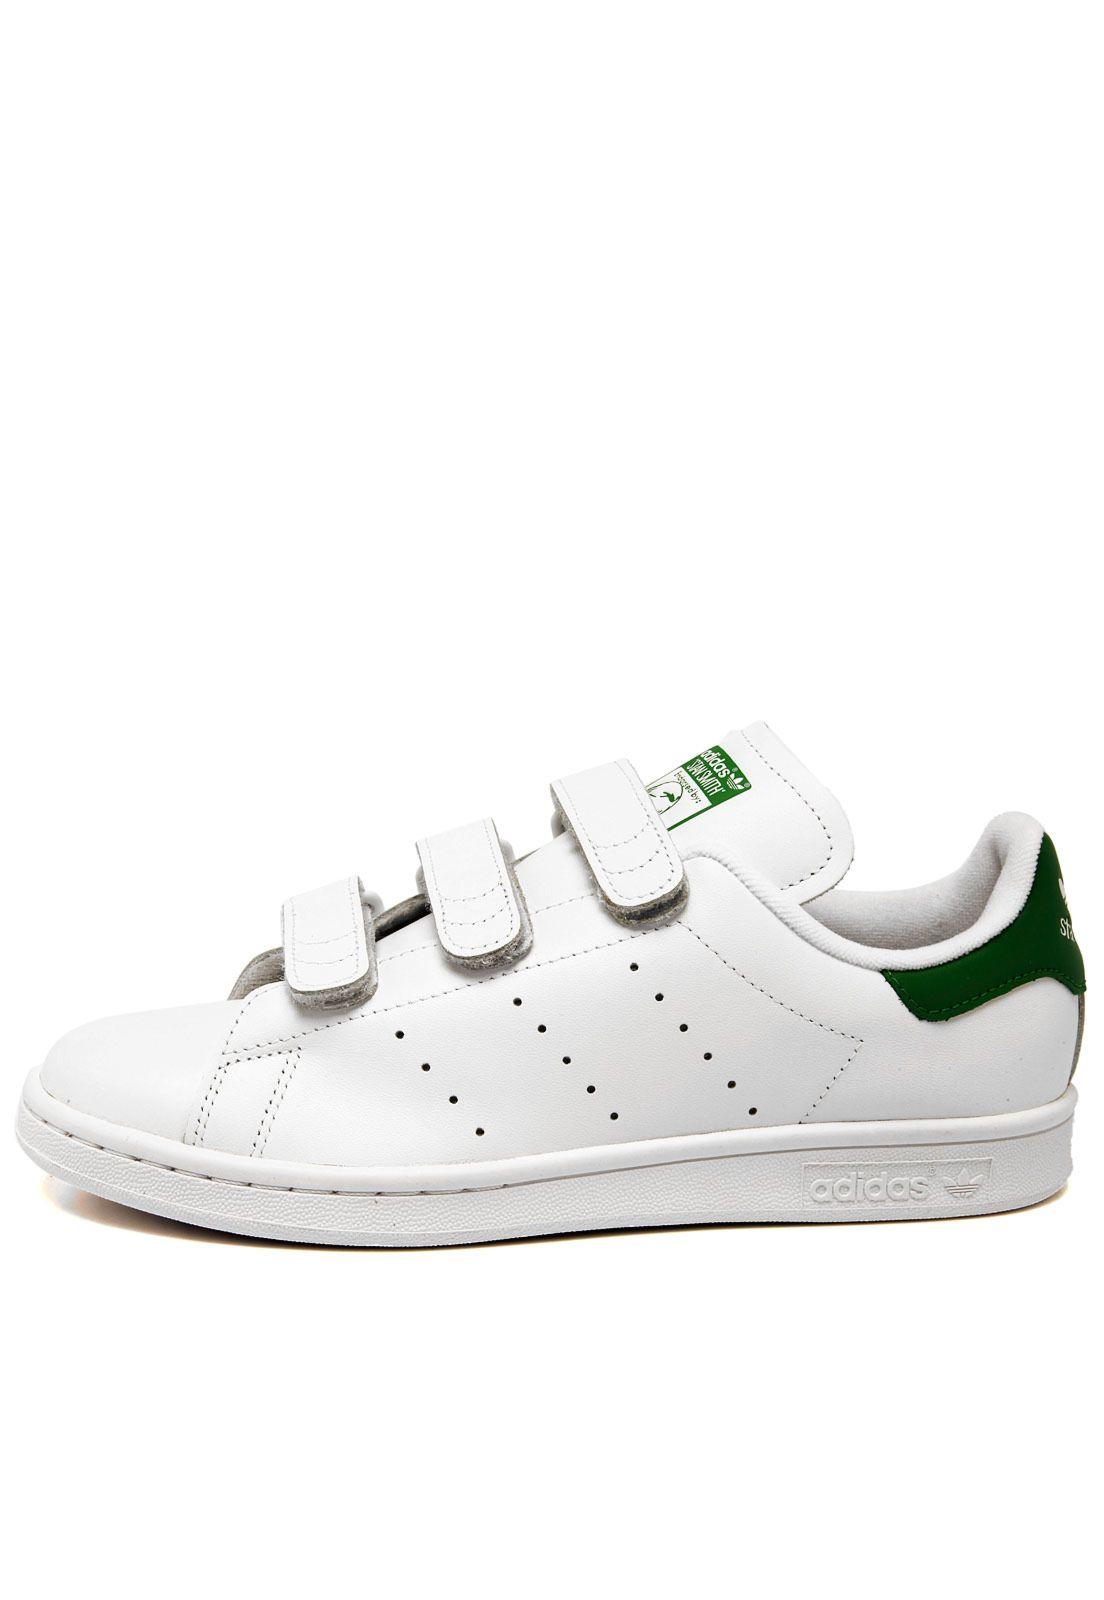 04bbc013fc5 Tênis Couro adidas Originals Stan Smith CF Branco Verde